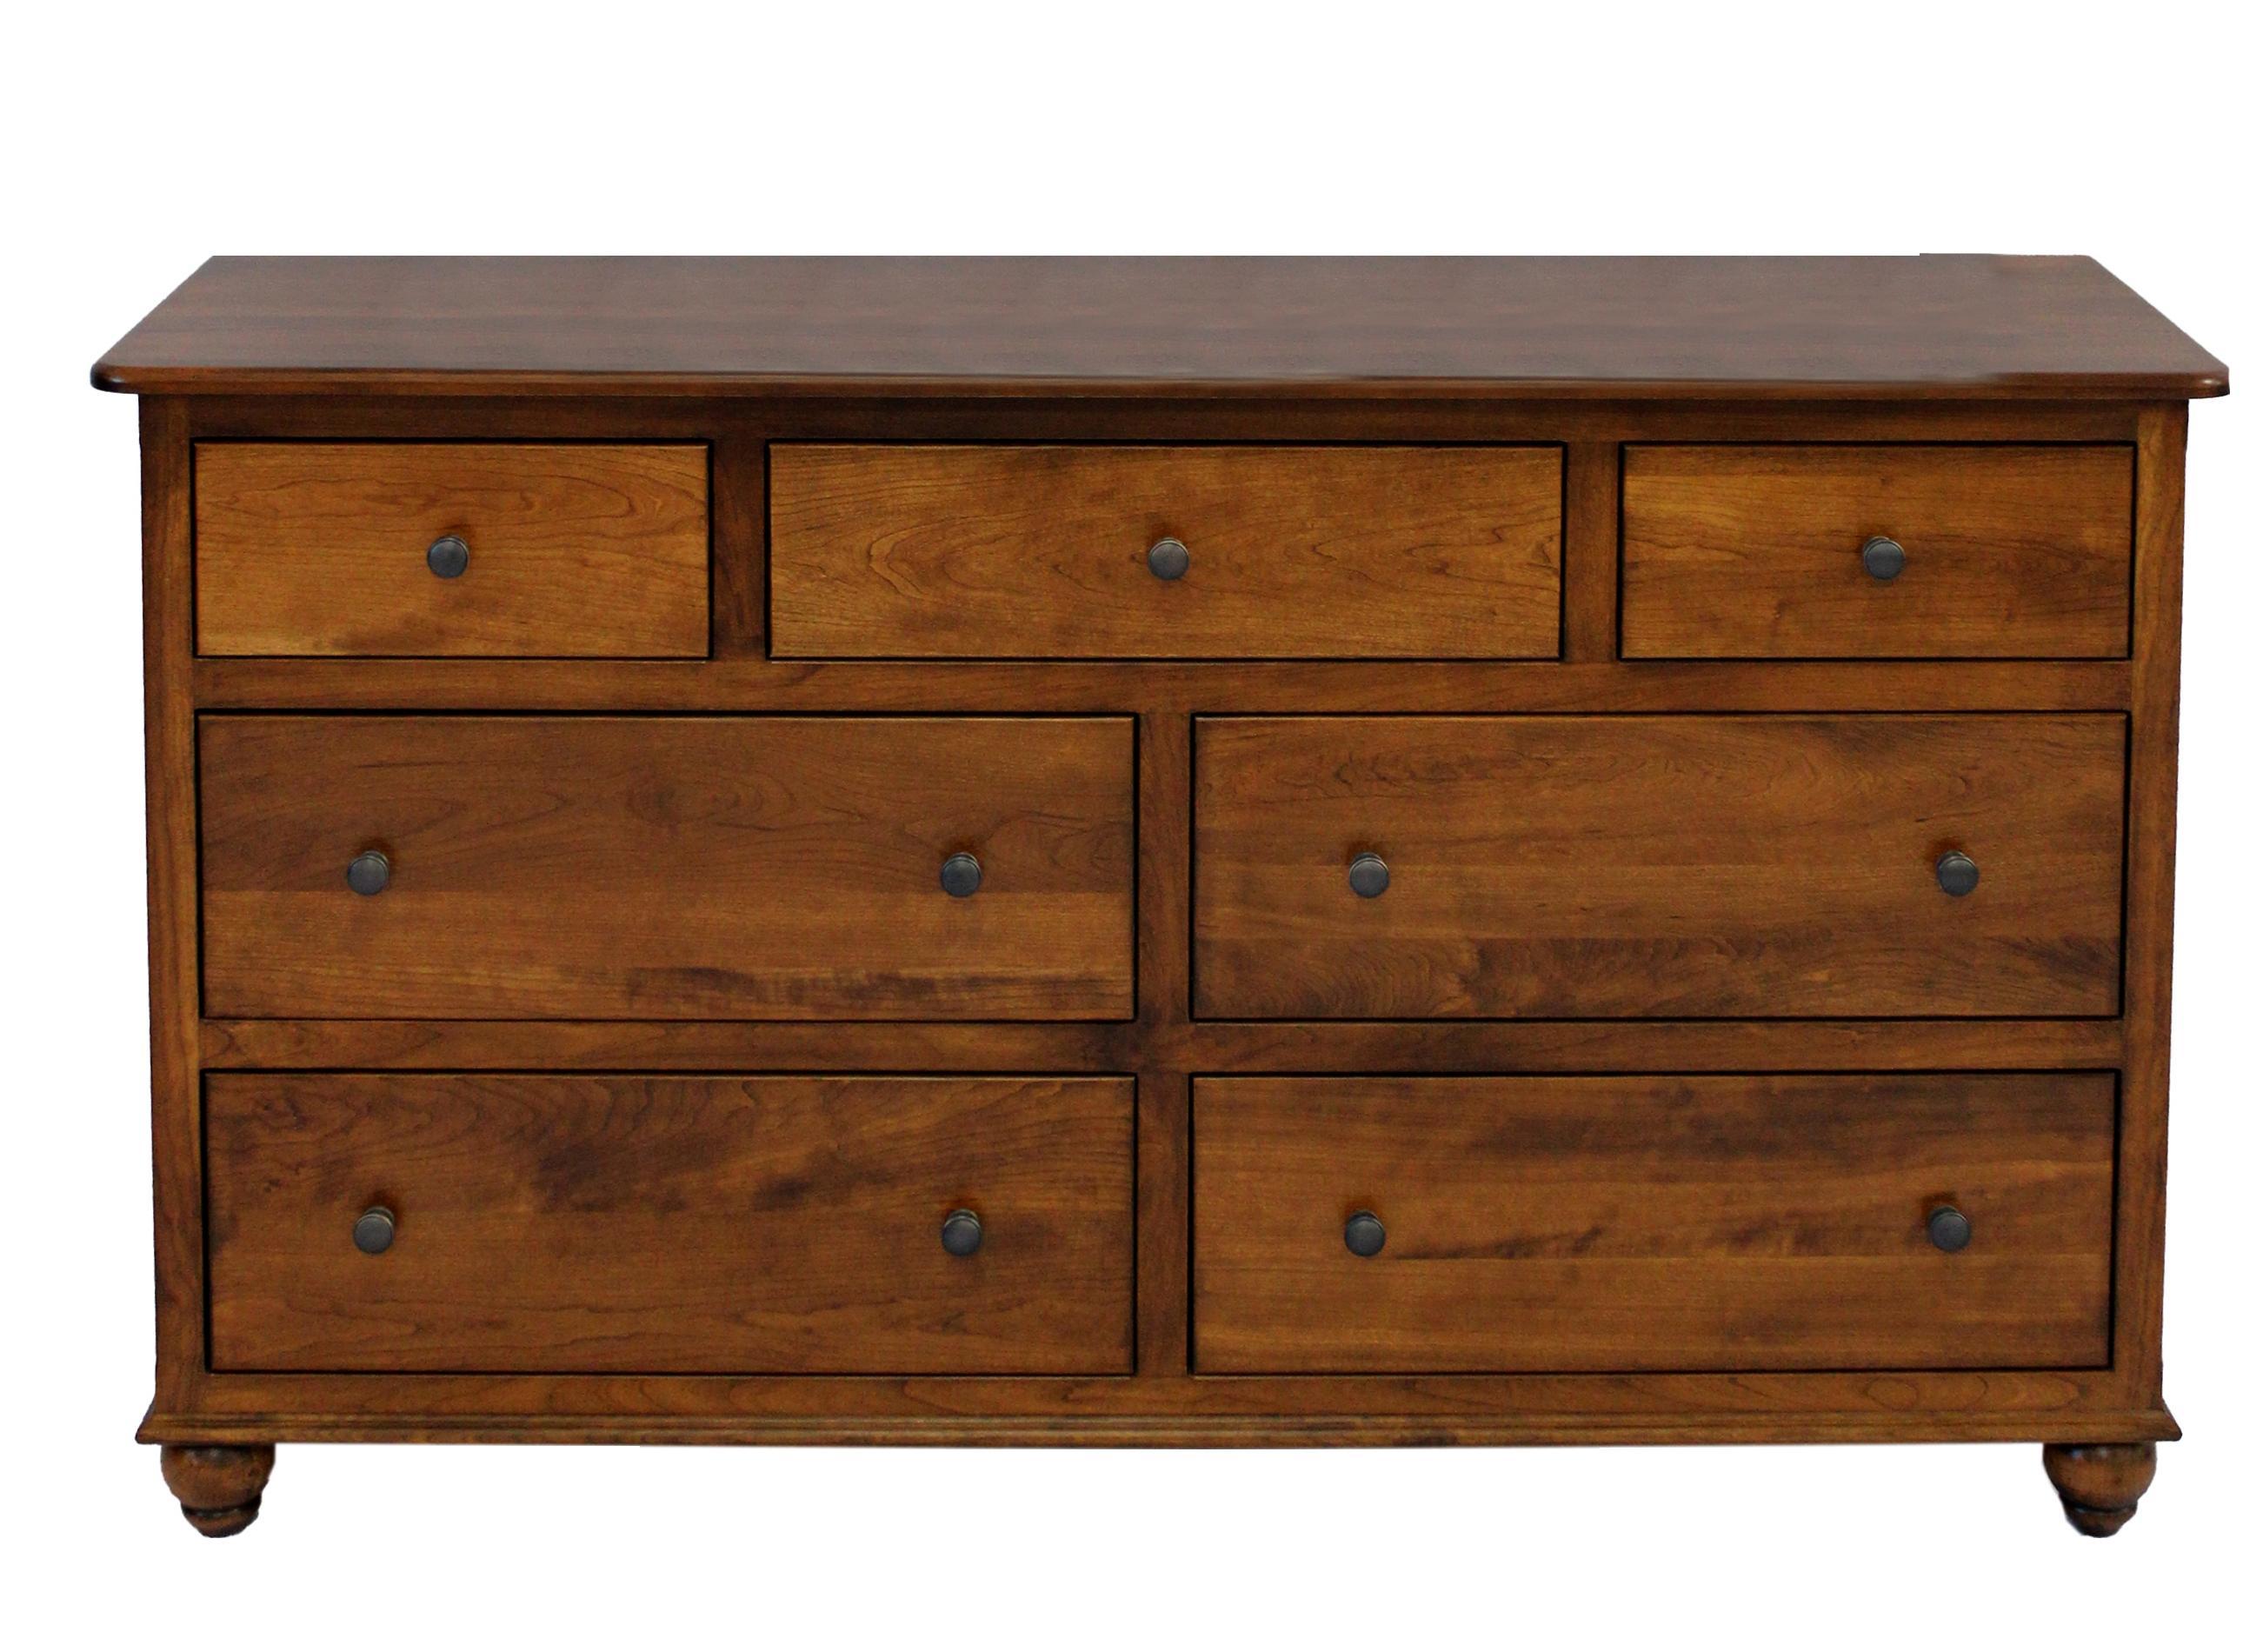 Covington Covington Dresser at Morris Home